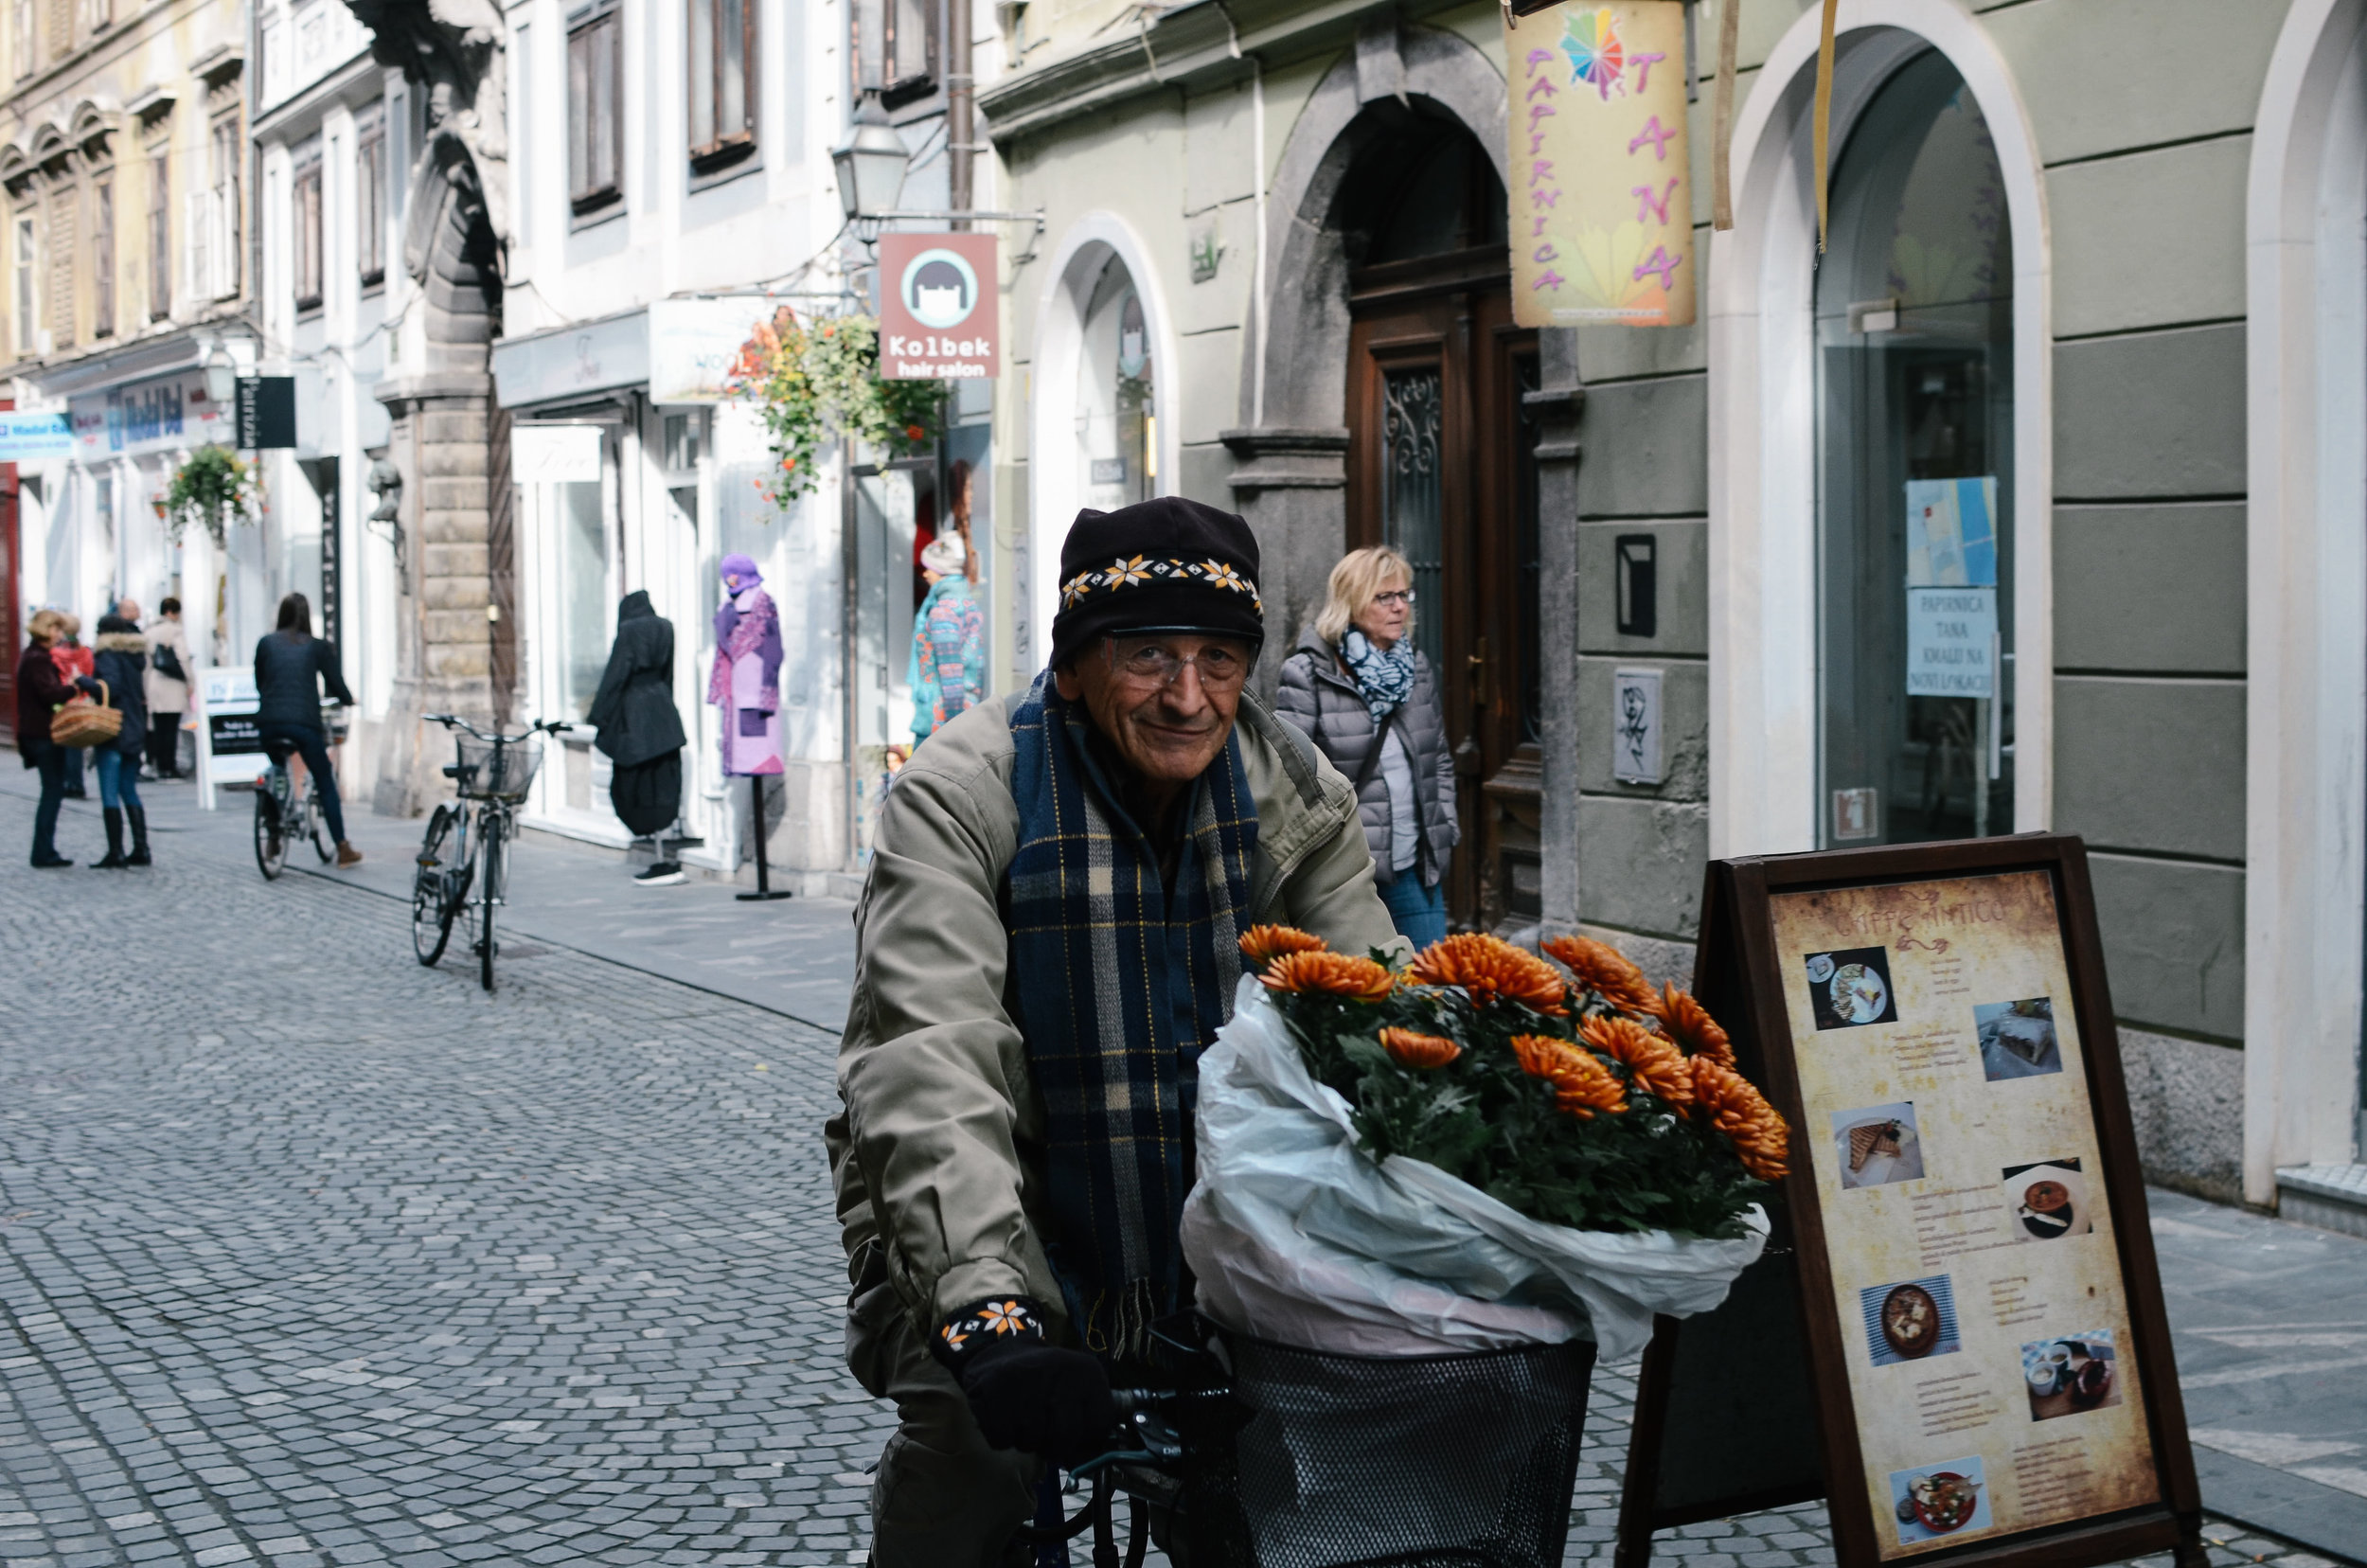 ljubljana-slovenia-travel-guide-lifeonpine_DSC_1752.jpg